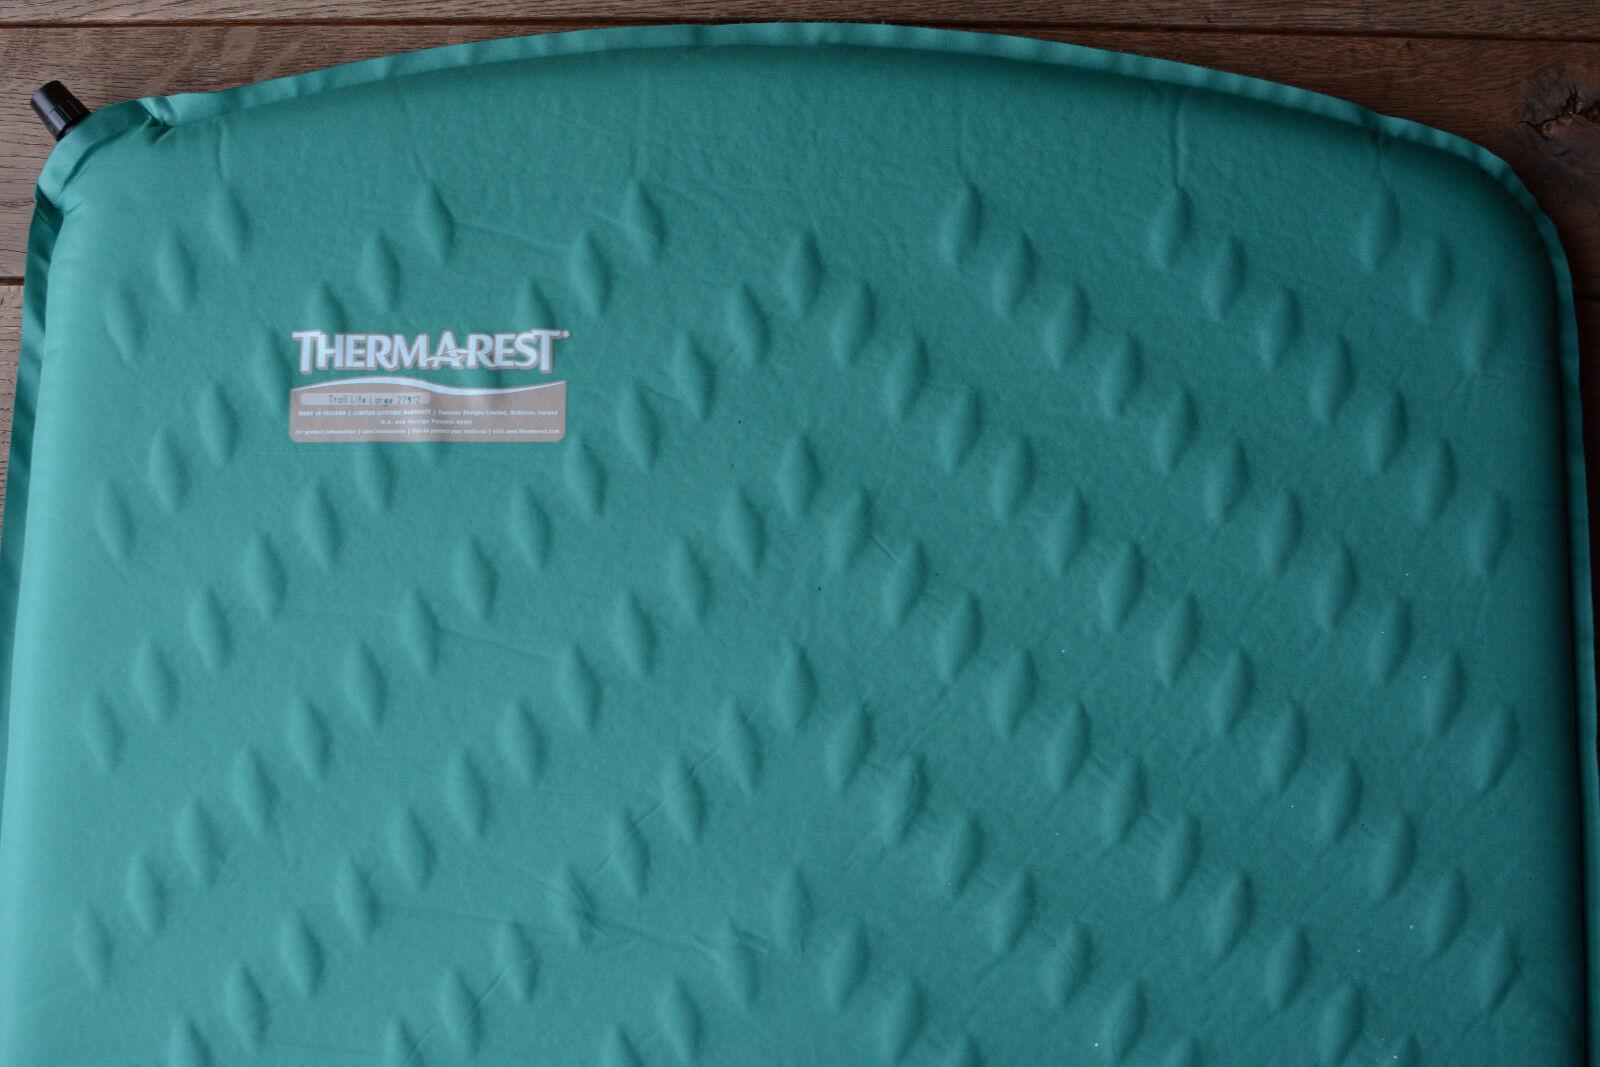 Therm-a-Rest Trail Lite Large Isomatte NEU 196 x 63 x 3 8 cm Matte Thermarest